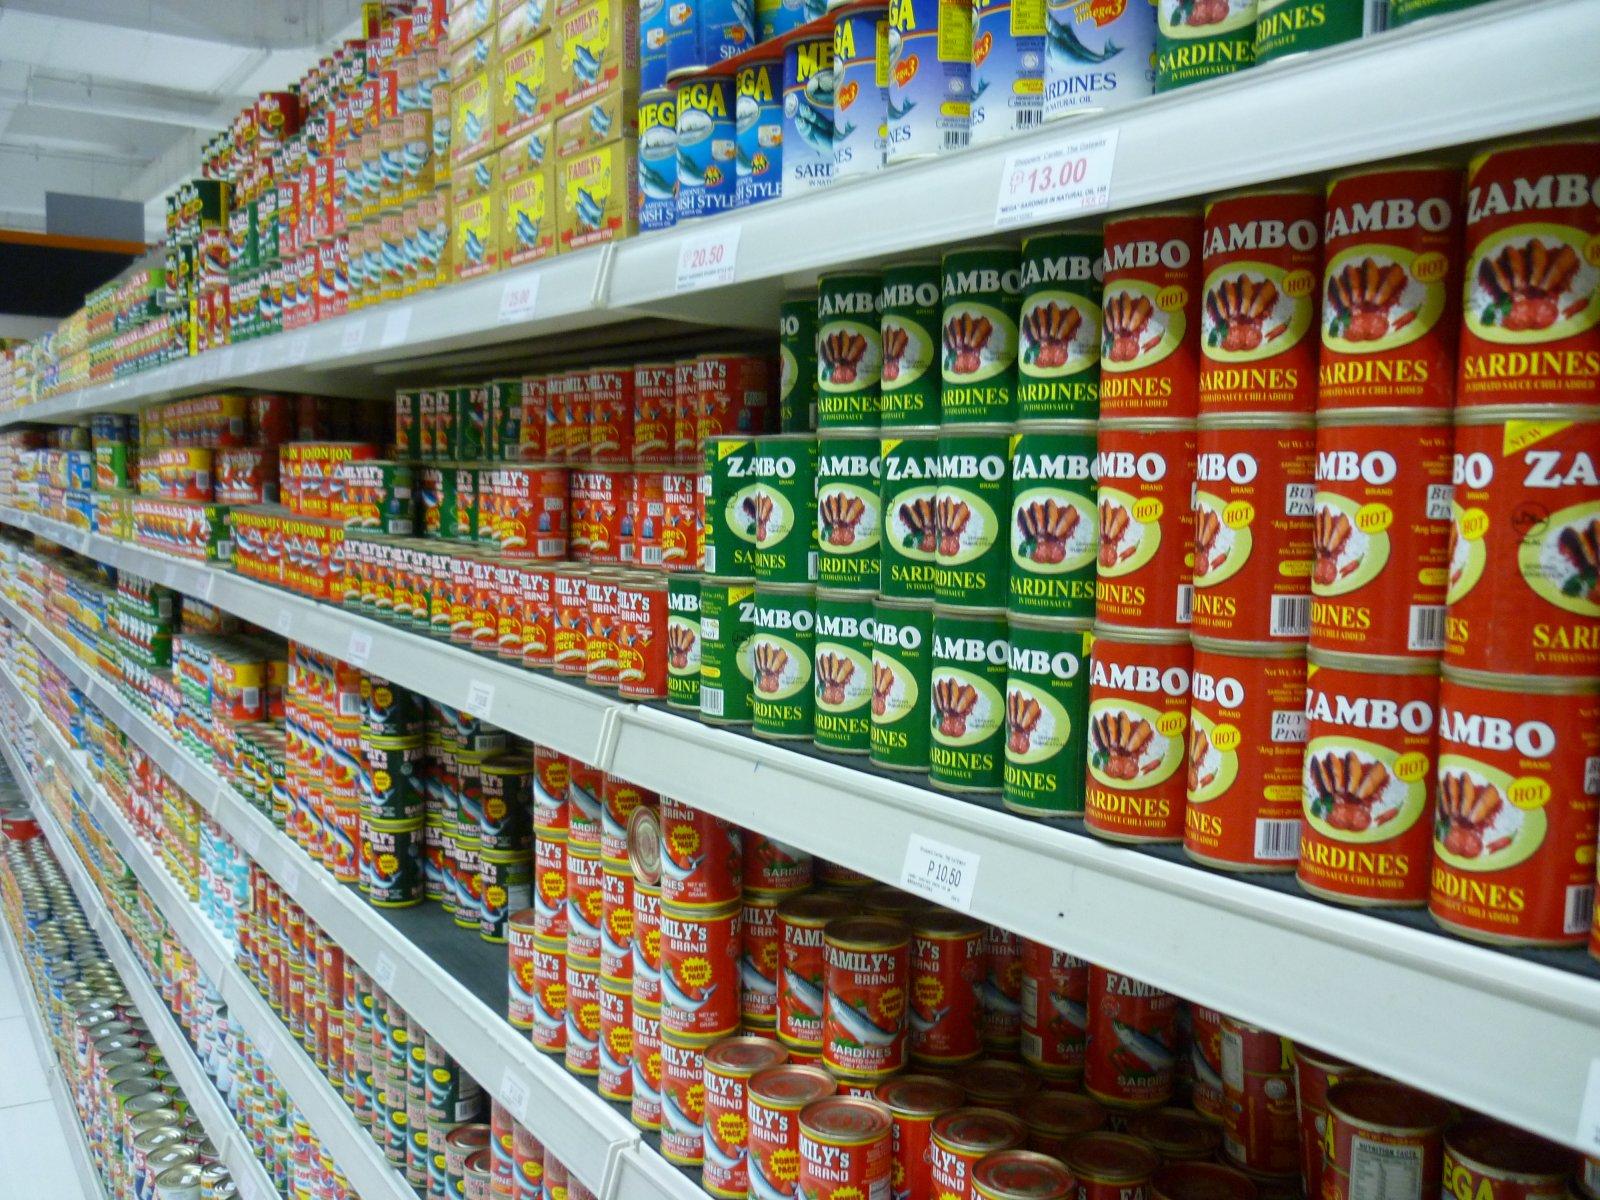 Lineal de supermercat